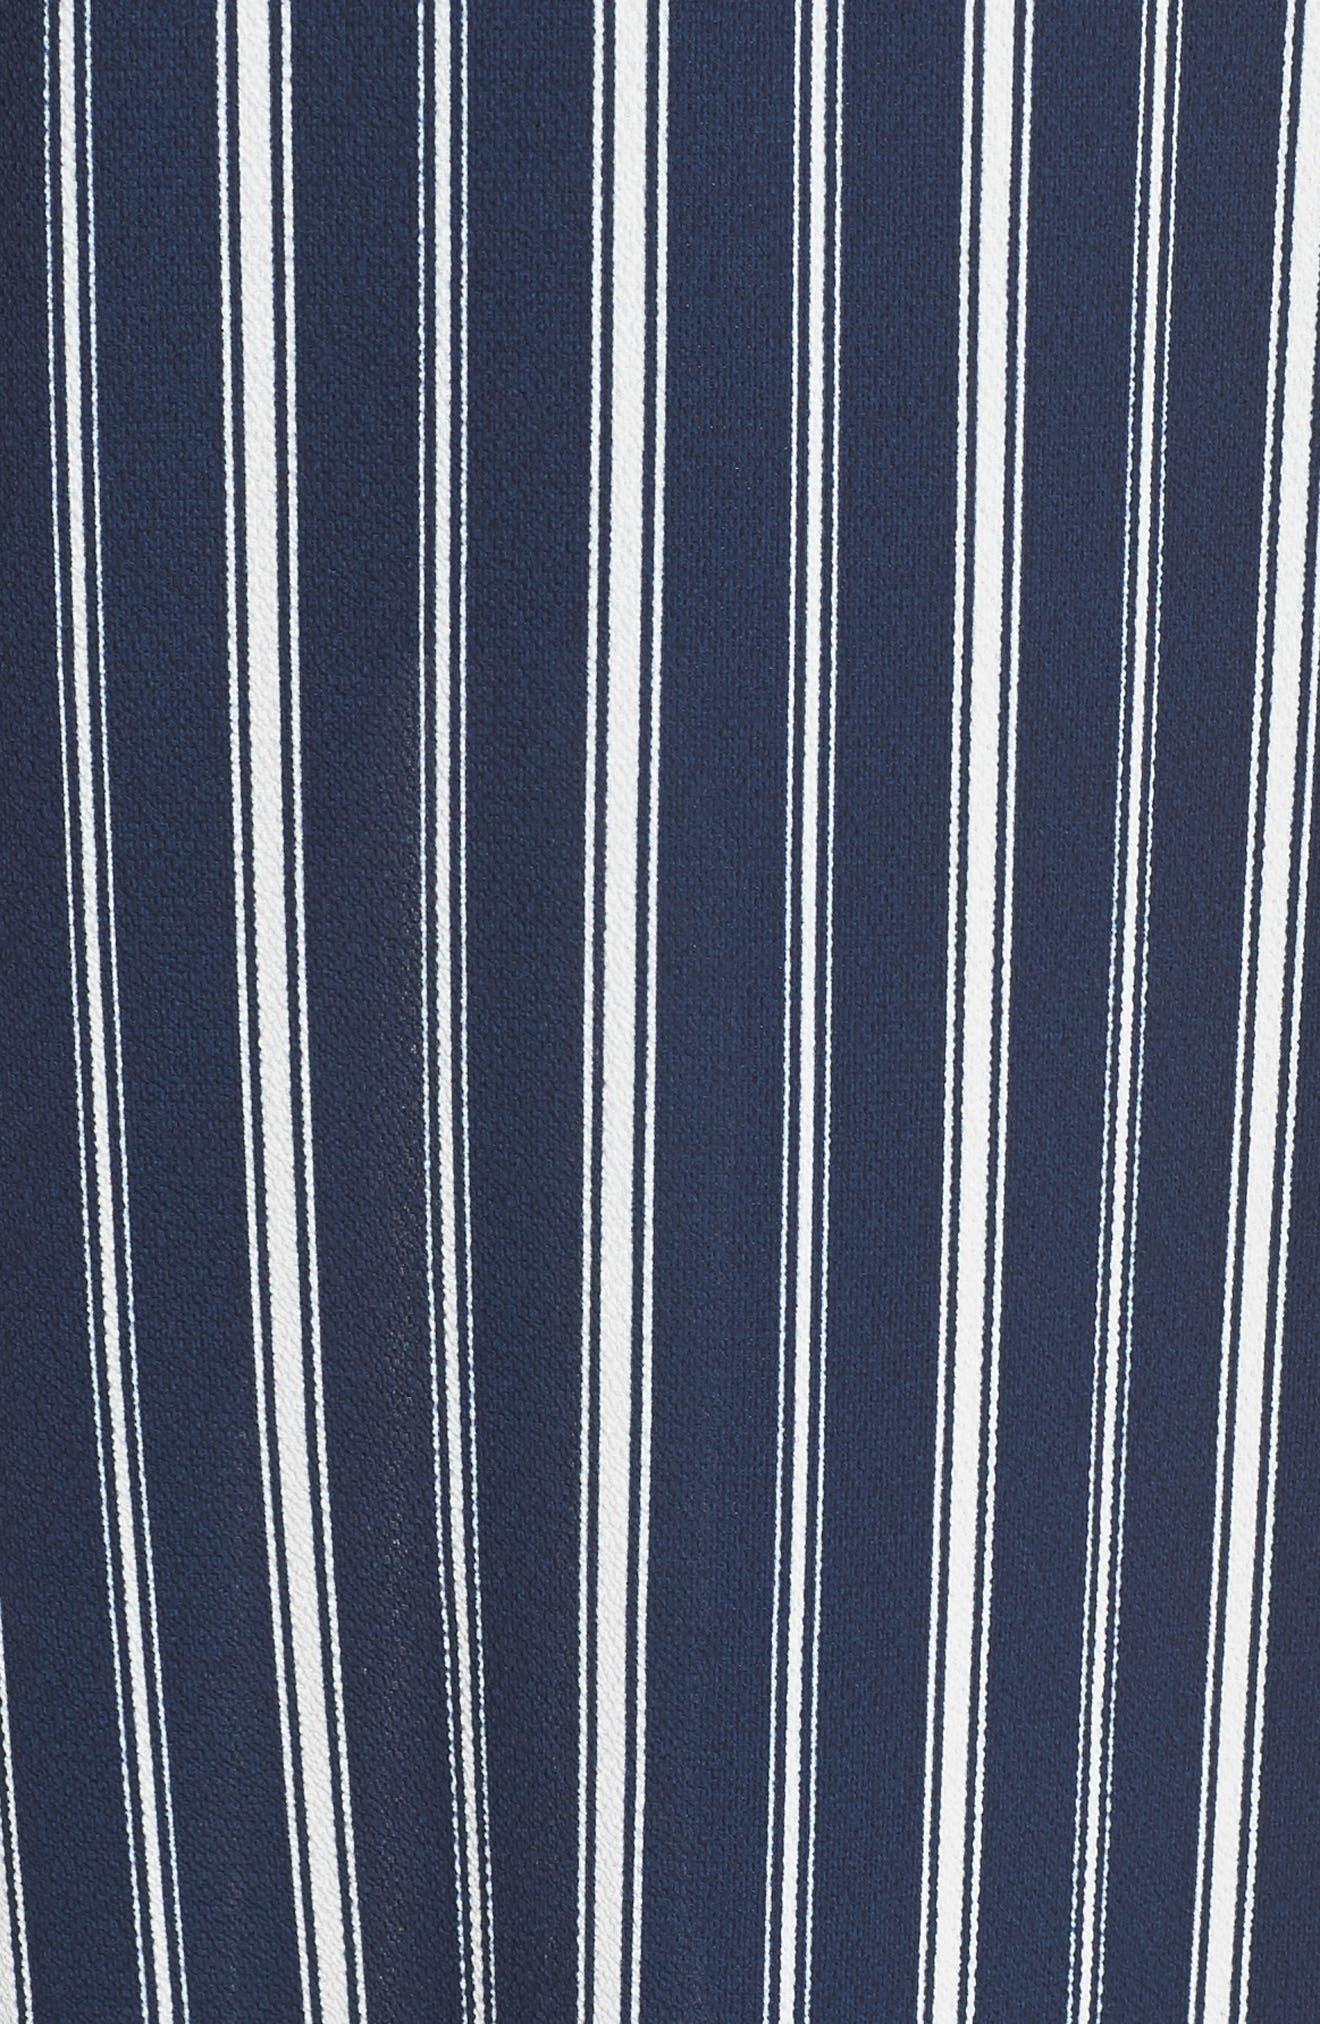 Knot Front Maxi Dress,                             Alternate thumbnail 5, color,                             439